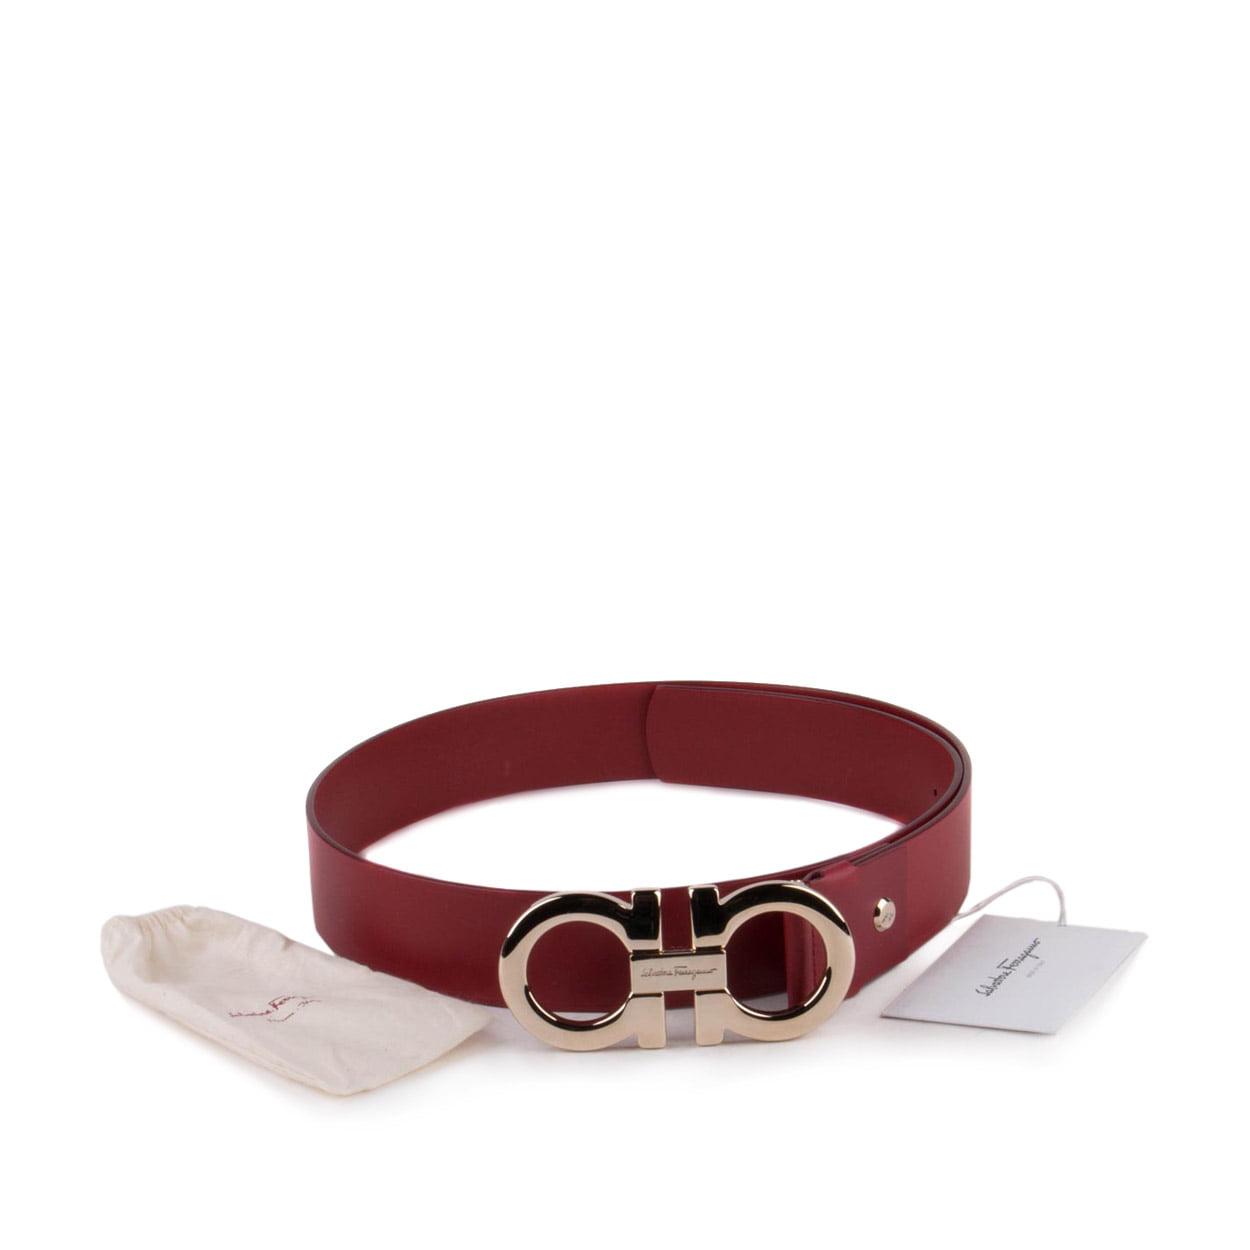 Salvatore Ferragamo Mens Double Gancio Adjustable Belt Ru...